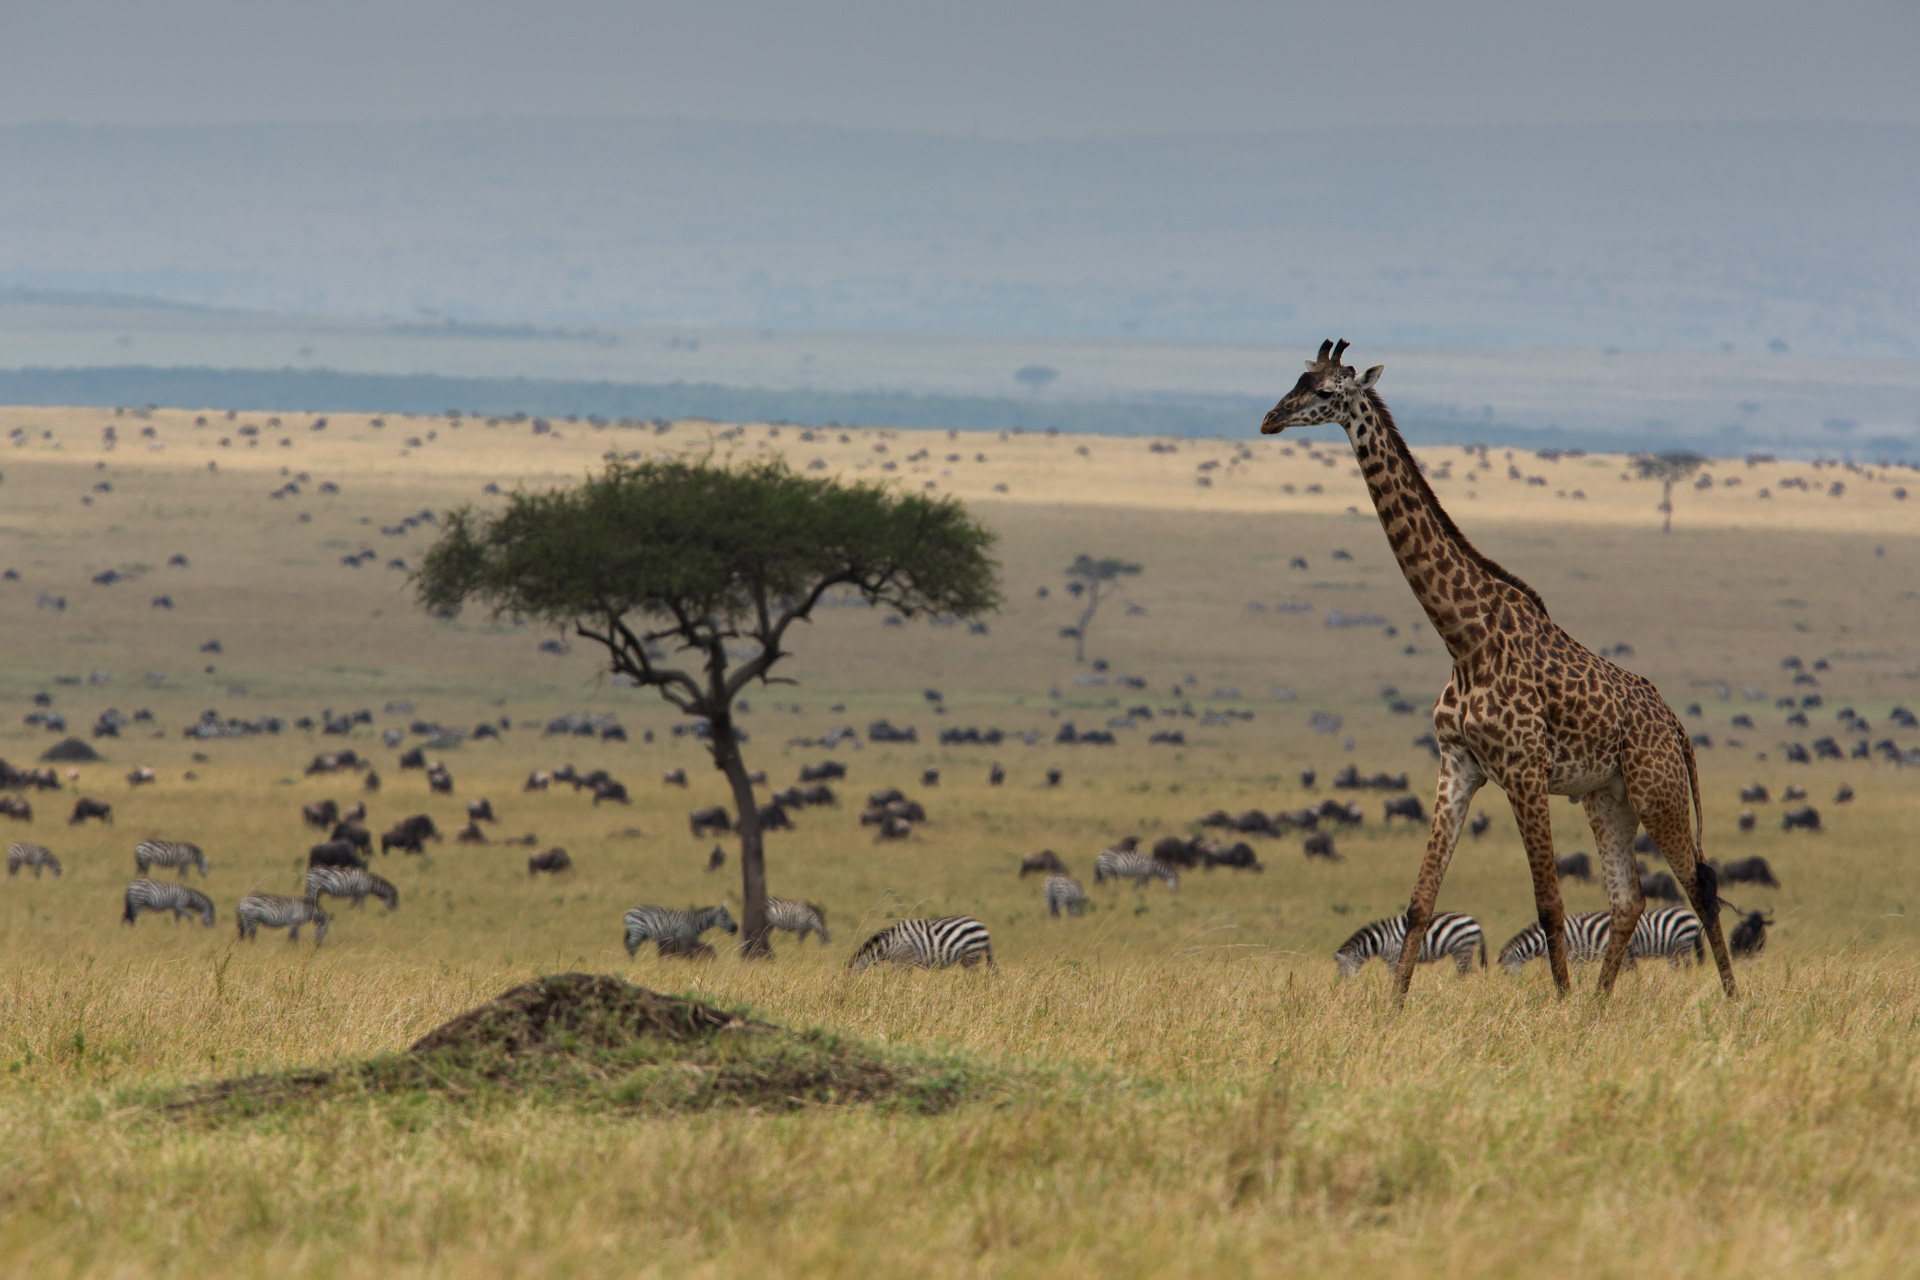 giraffe in the landscape